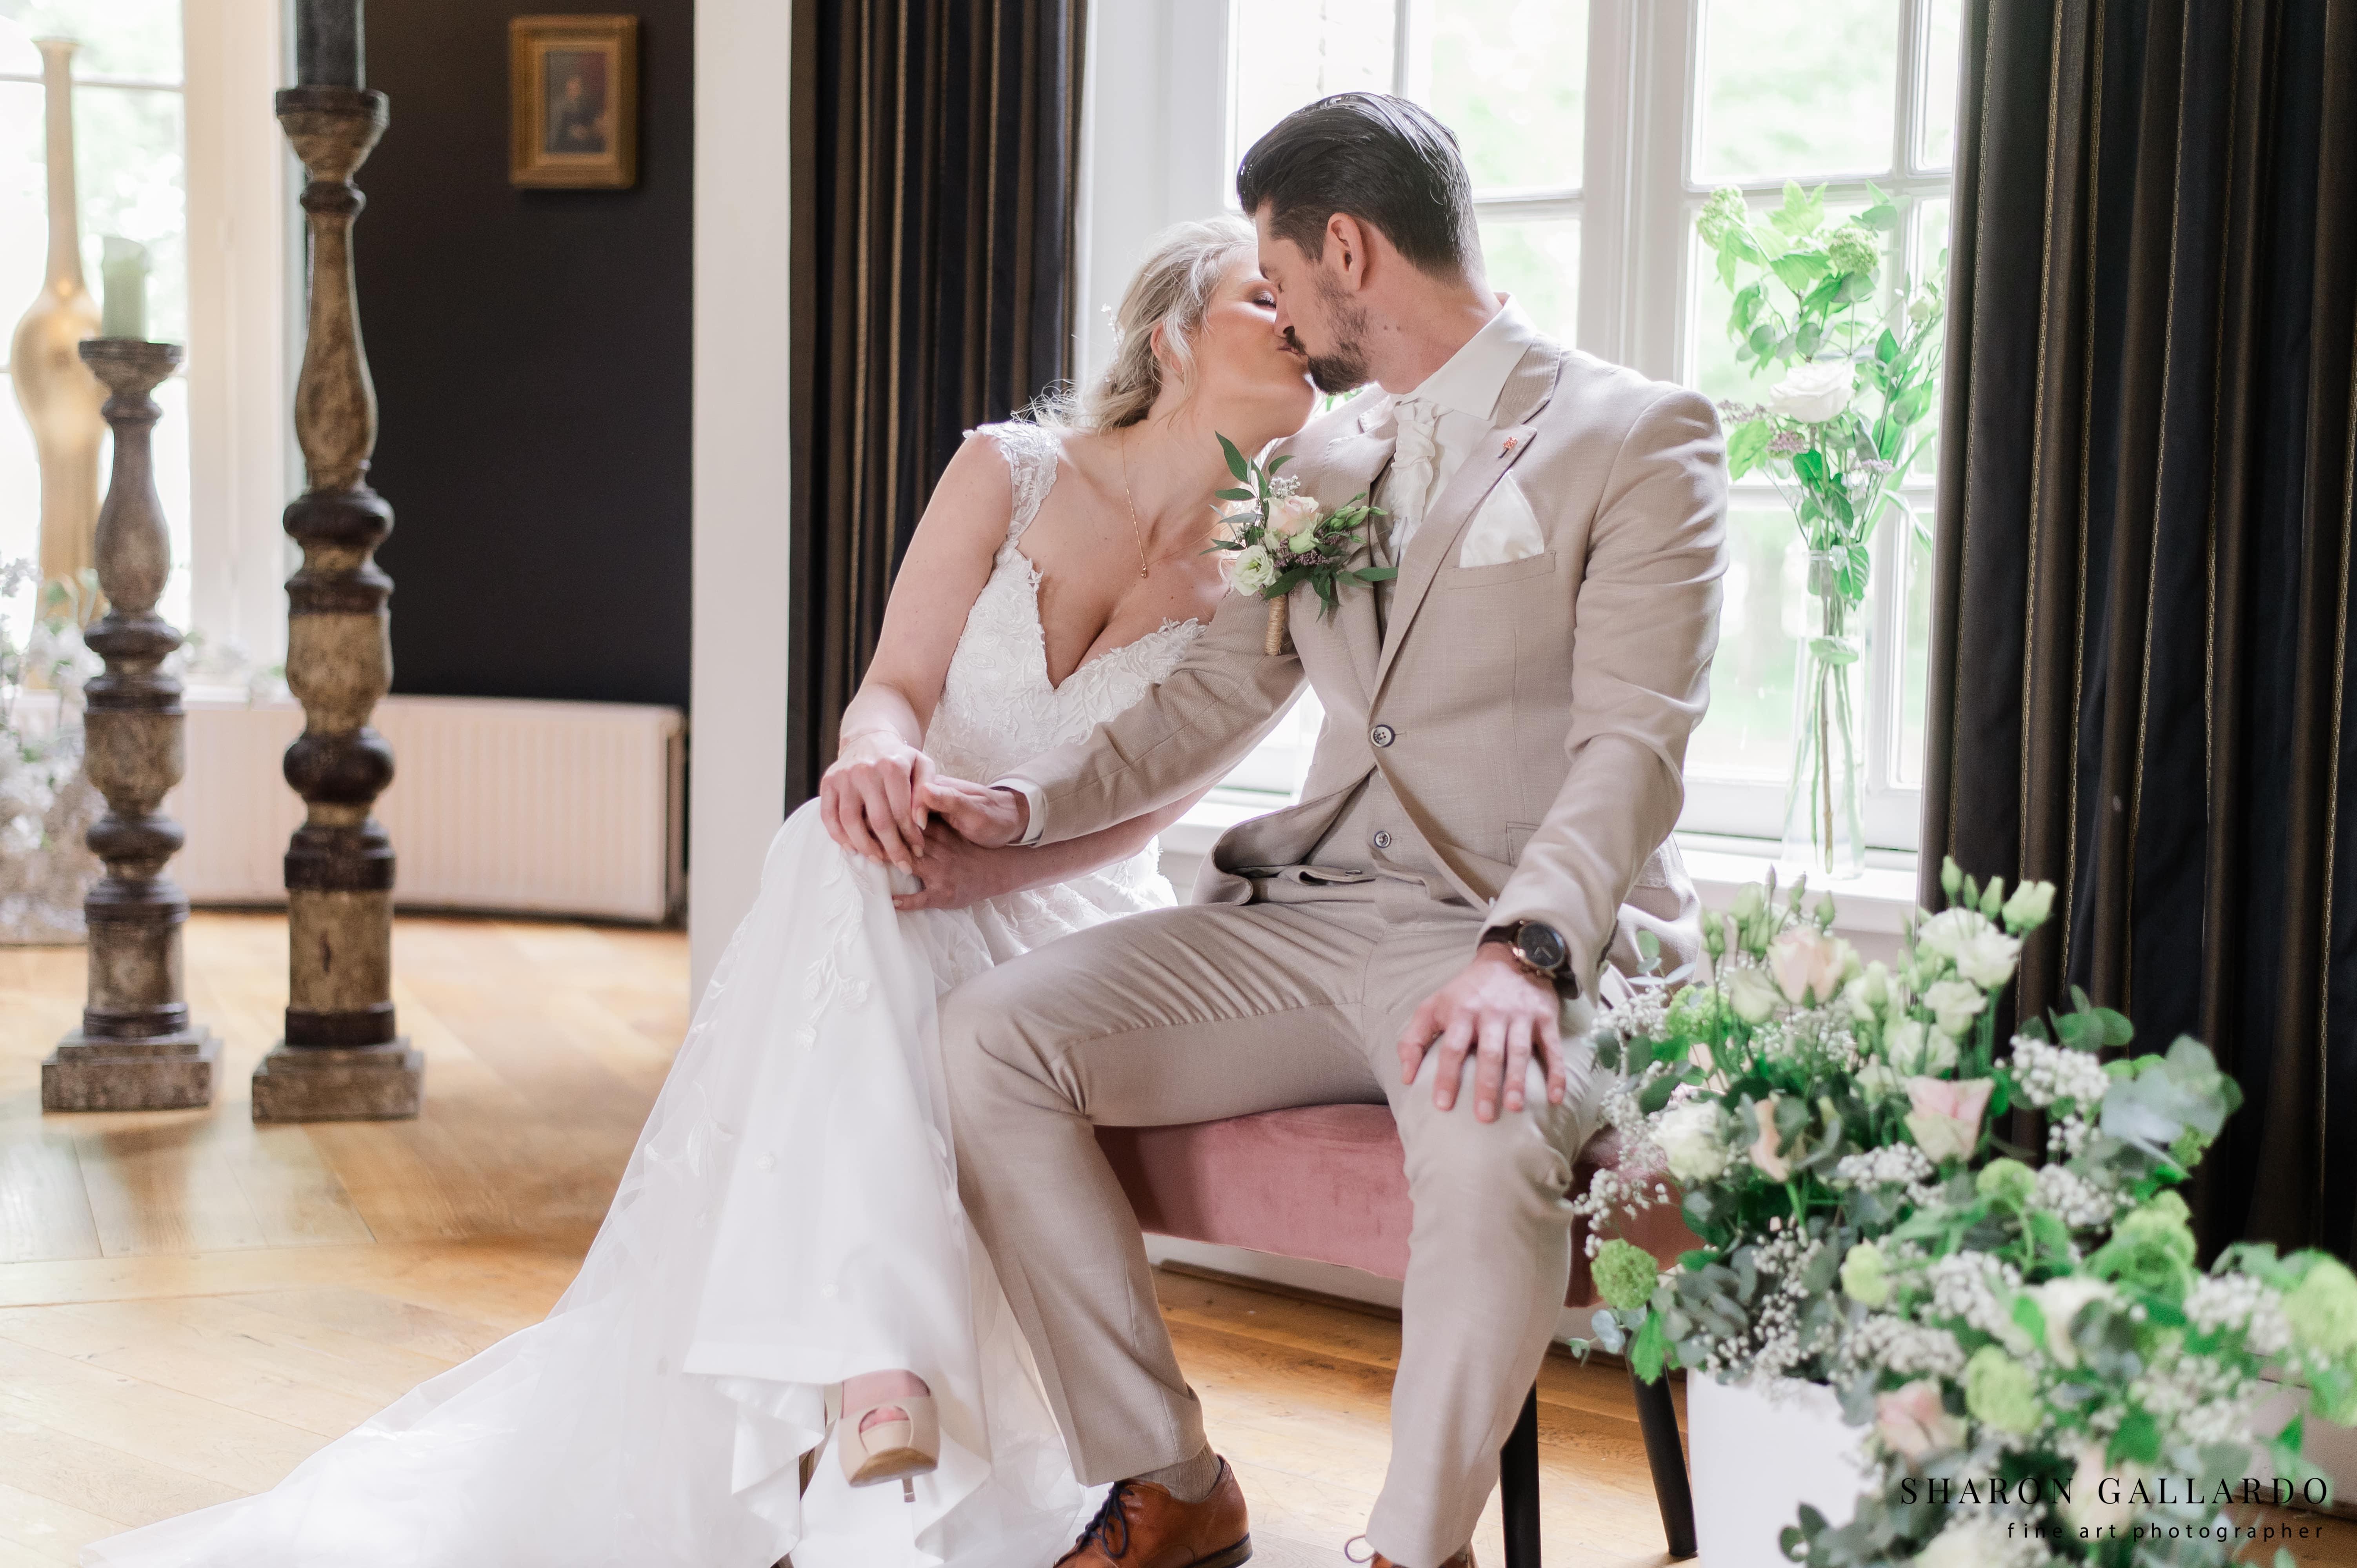 bruid en bruidegom kus ja-woord